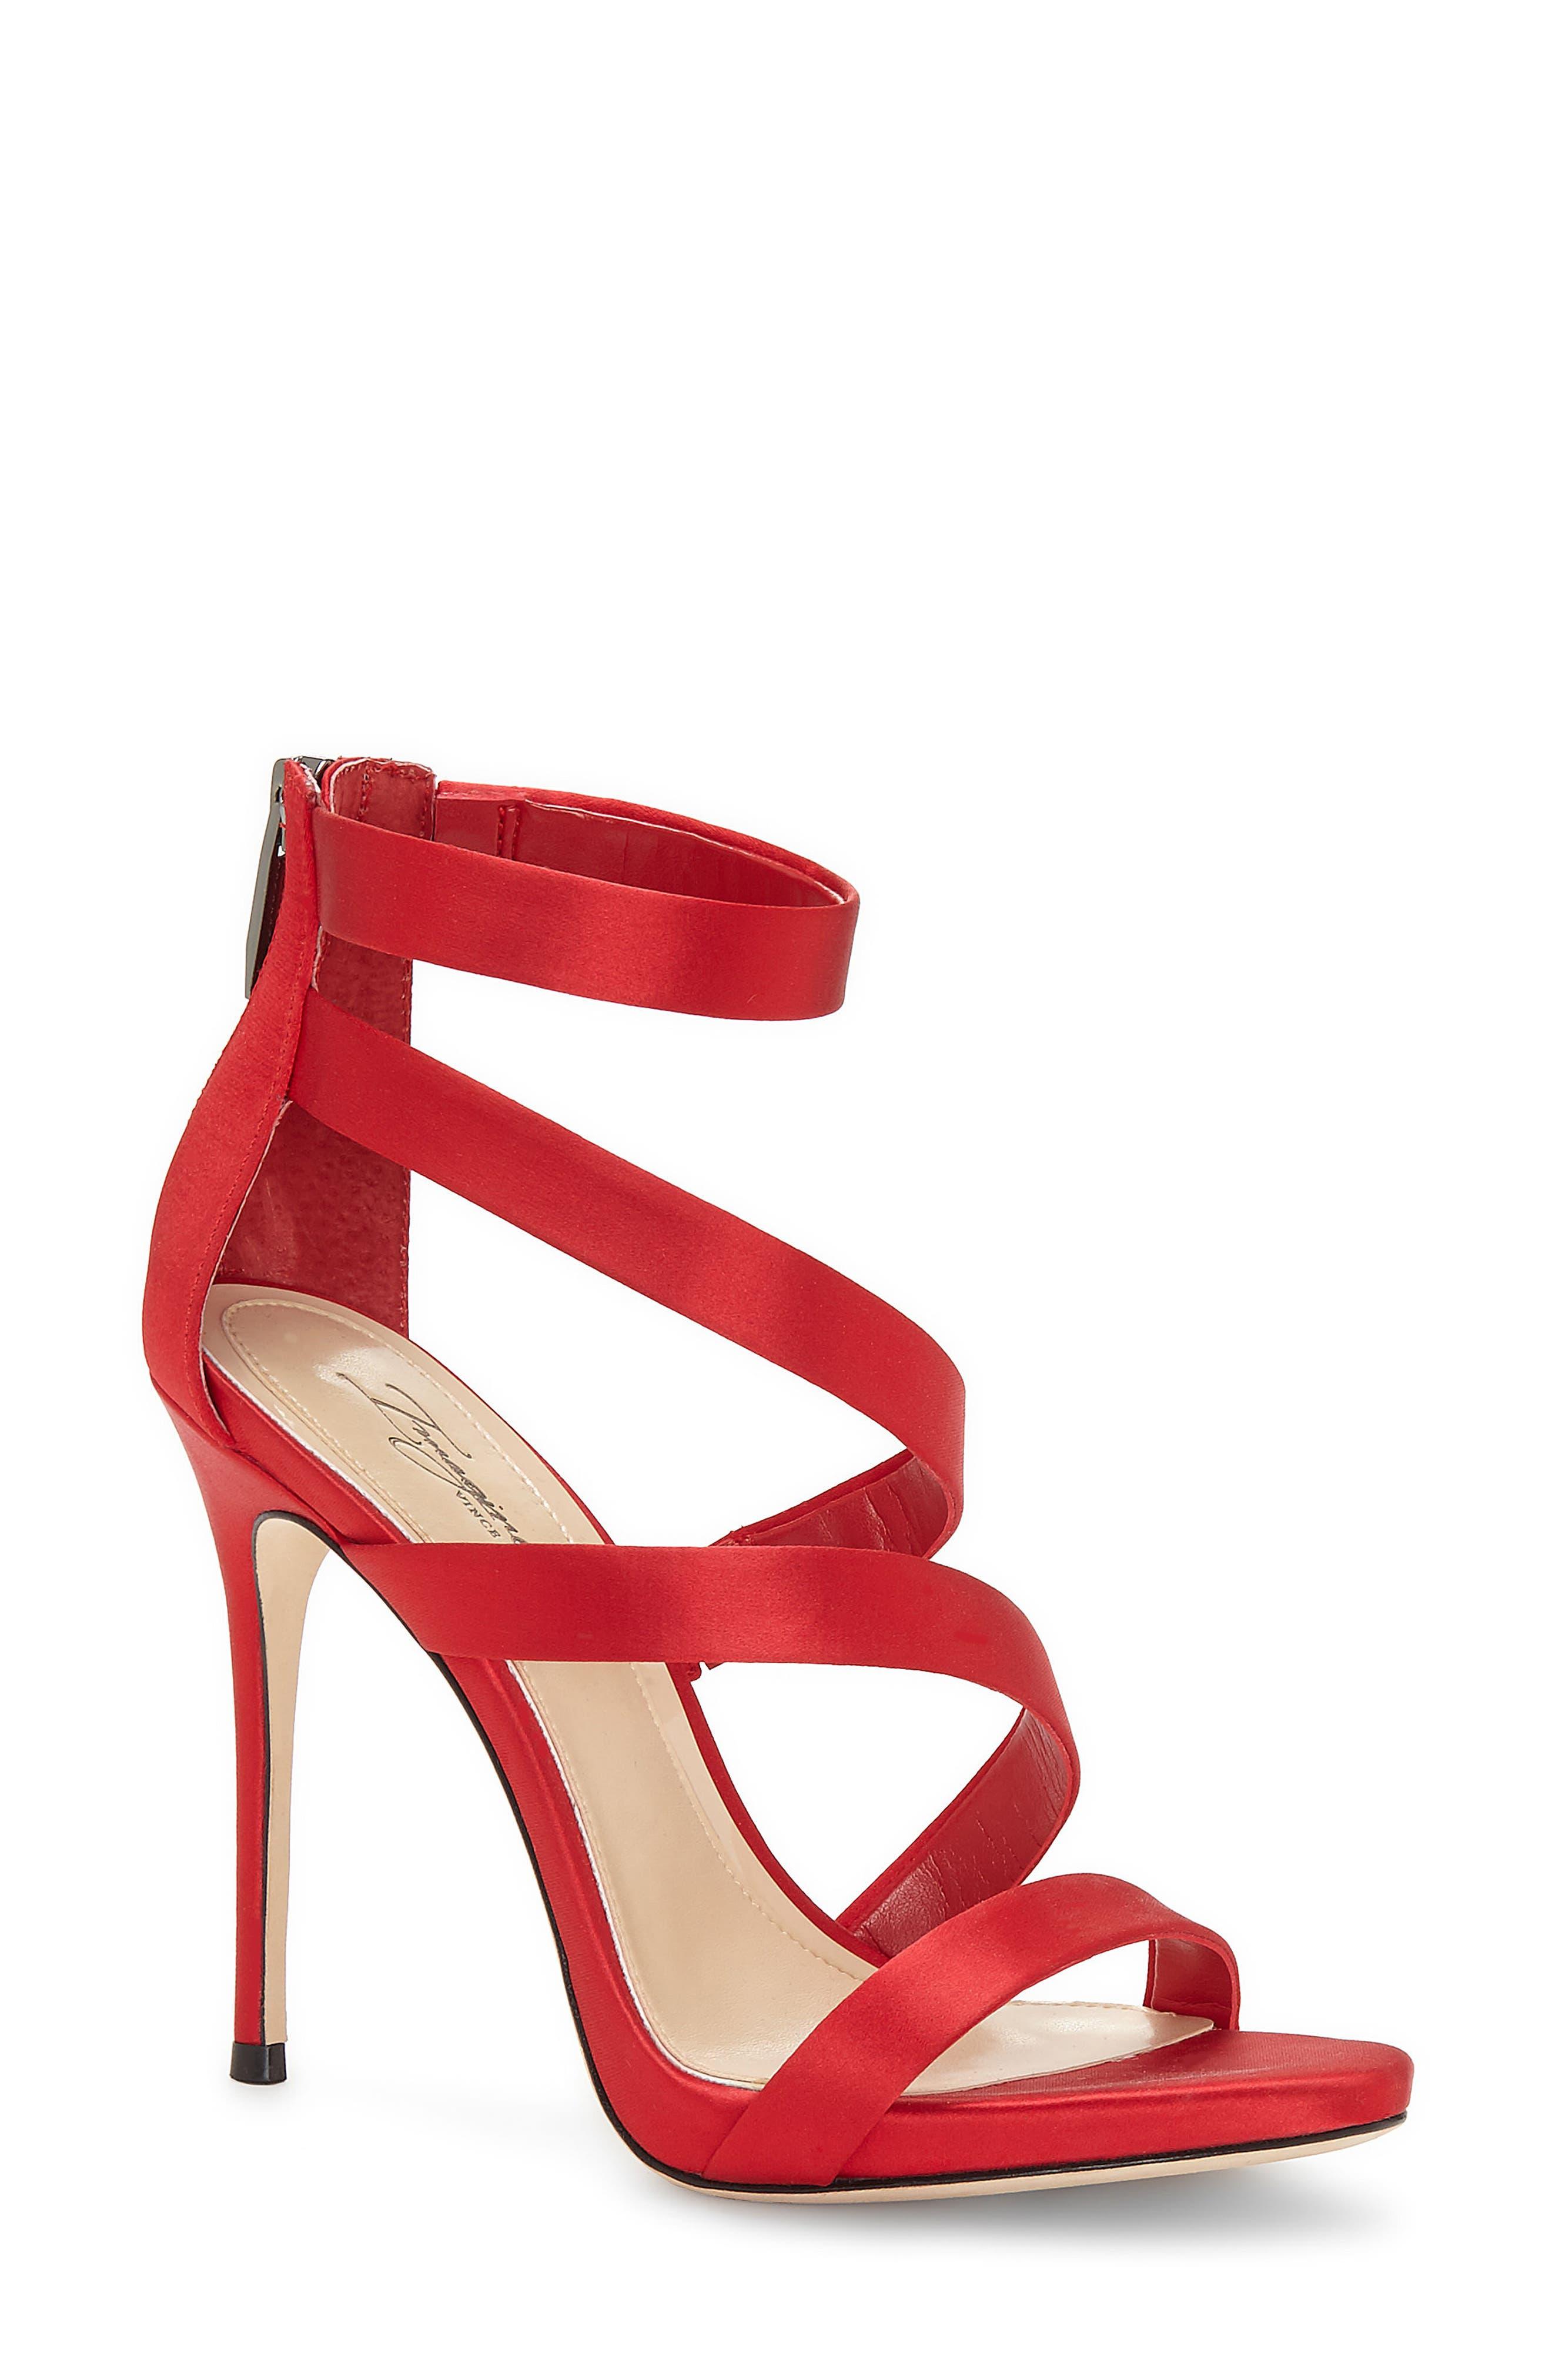 Imagine Vince Camuto Dalles Tall Strappy Sandal,                             Main thumbnail 1, color,                             Crimson Satin